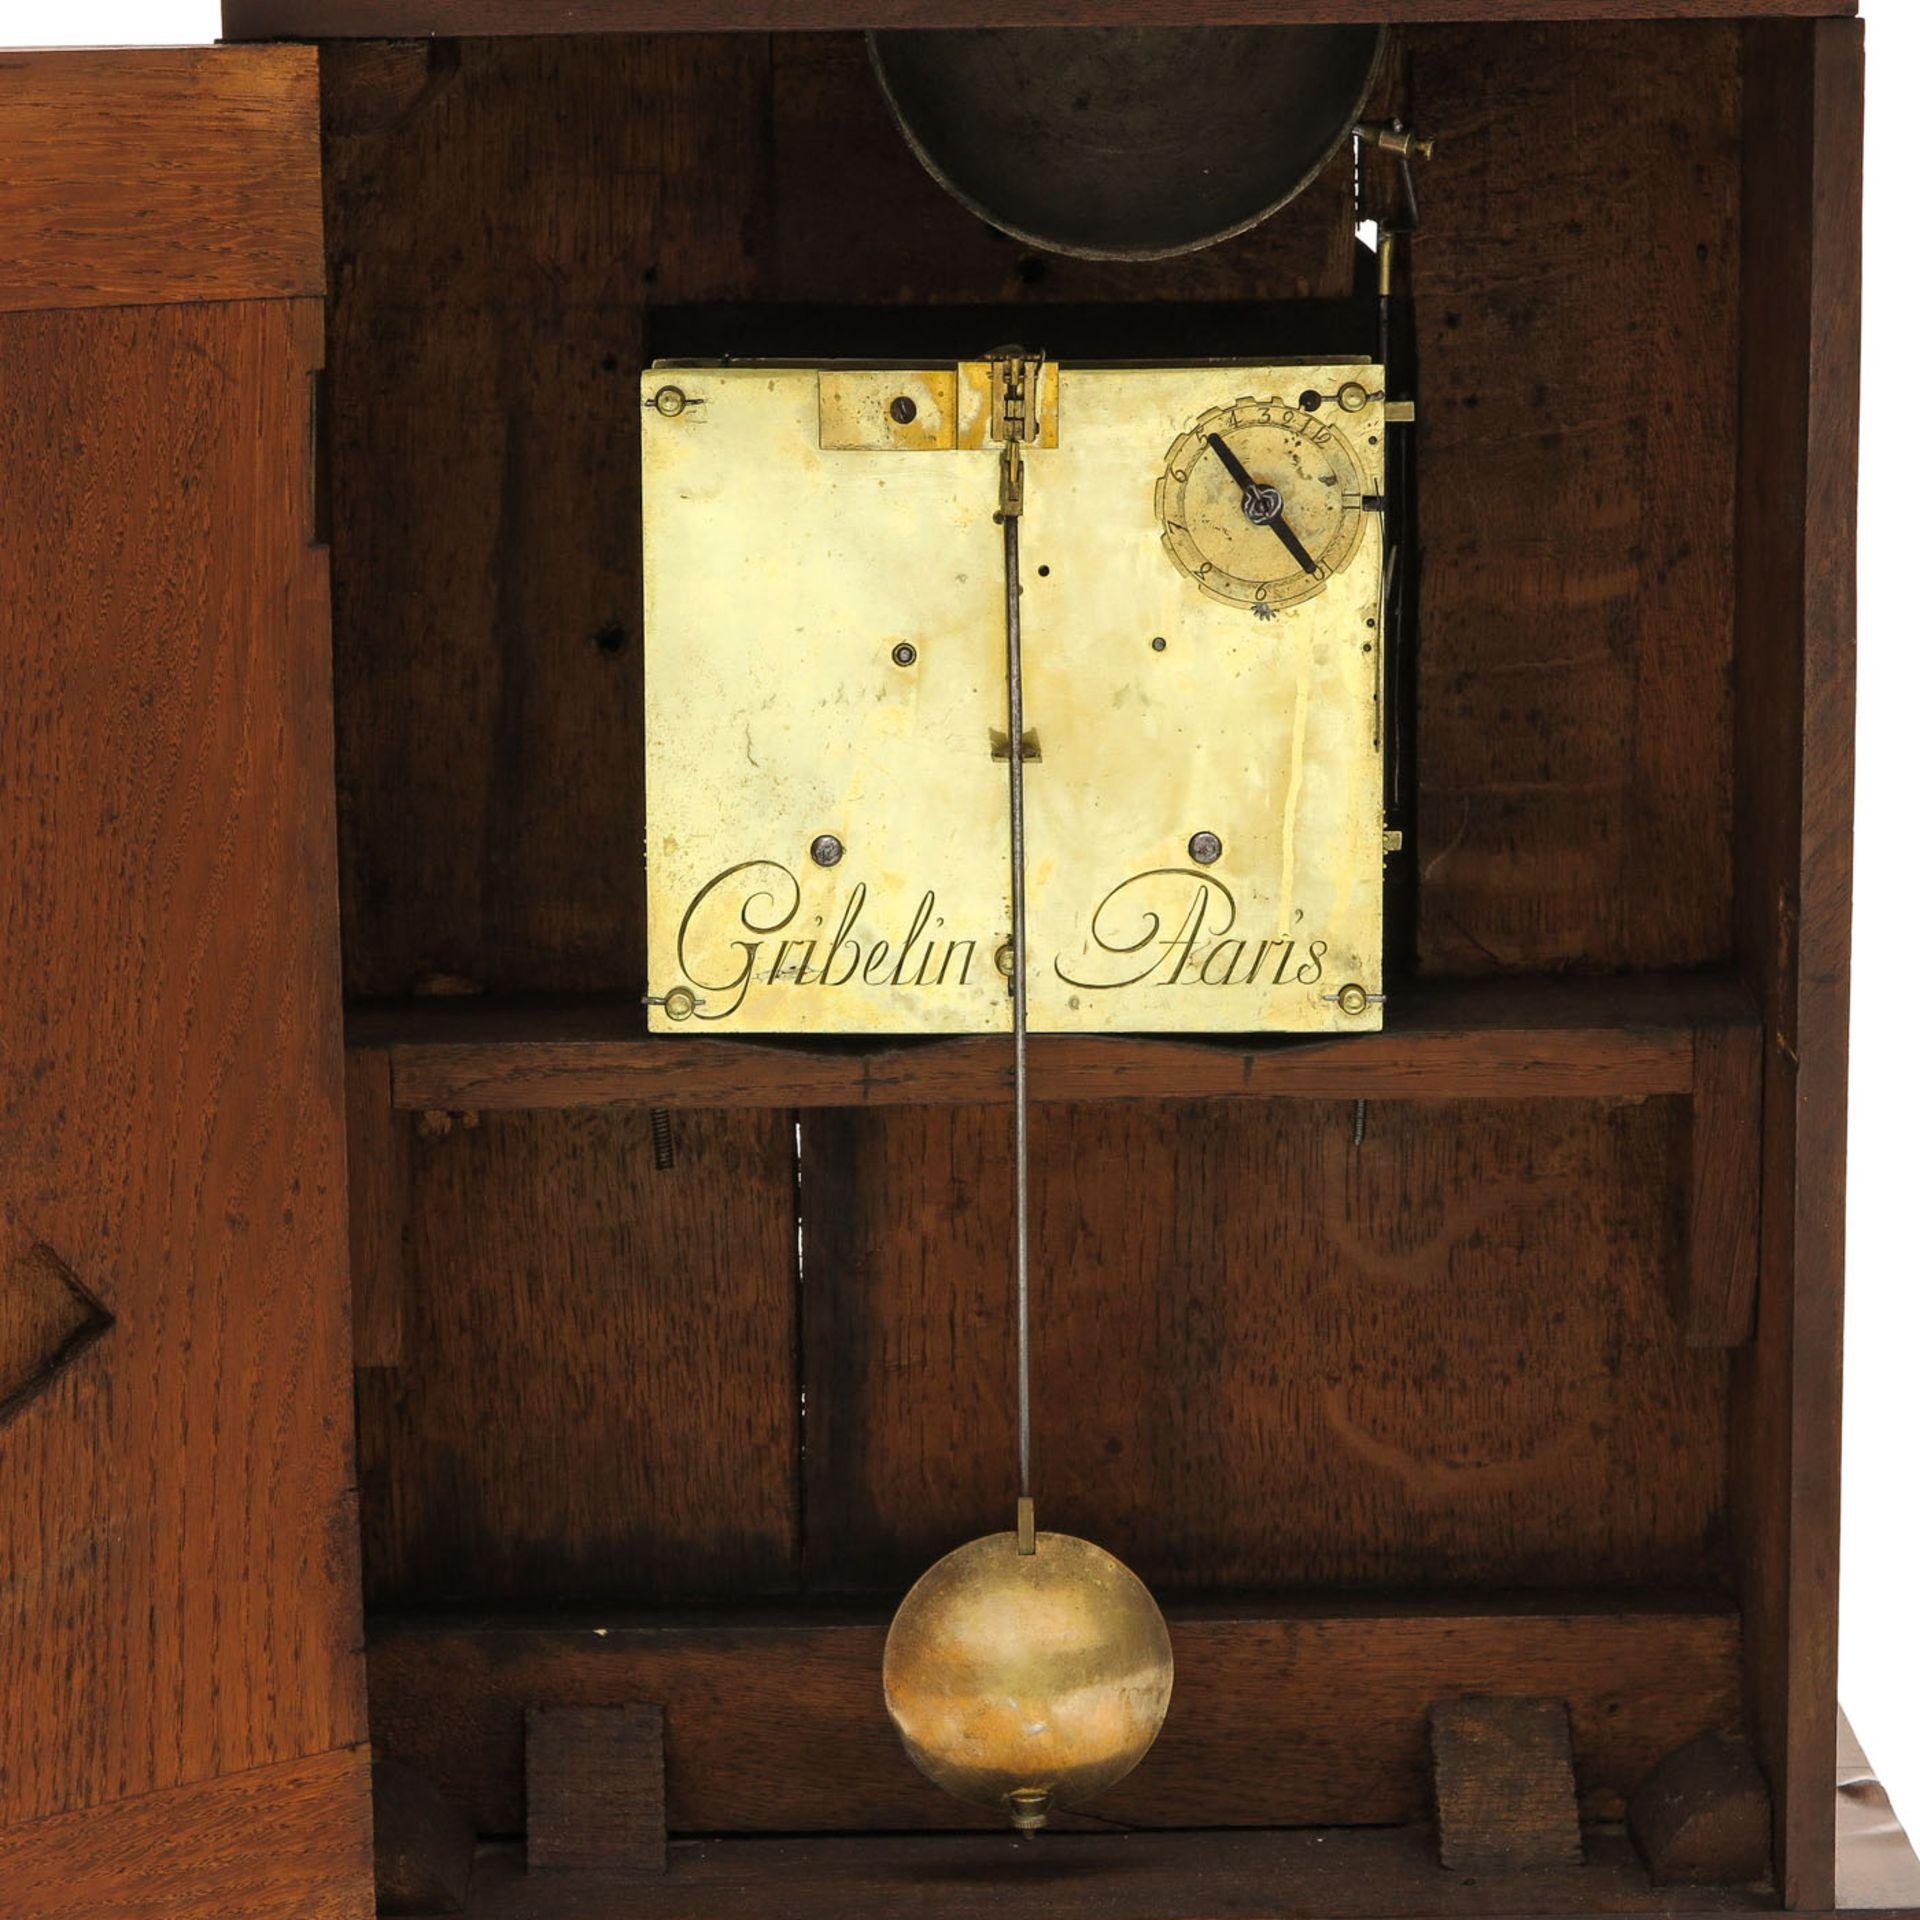 Los 1085 - An Signed Religious Clock Circa 1690